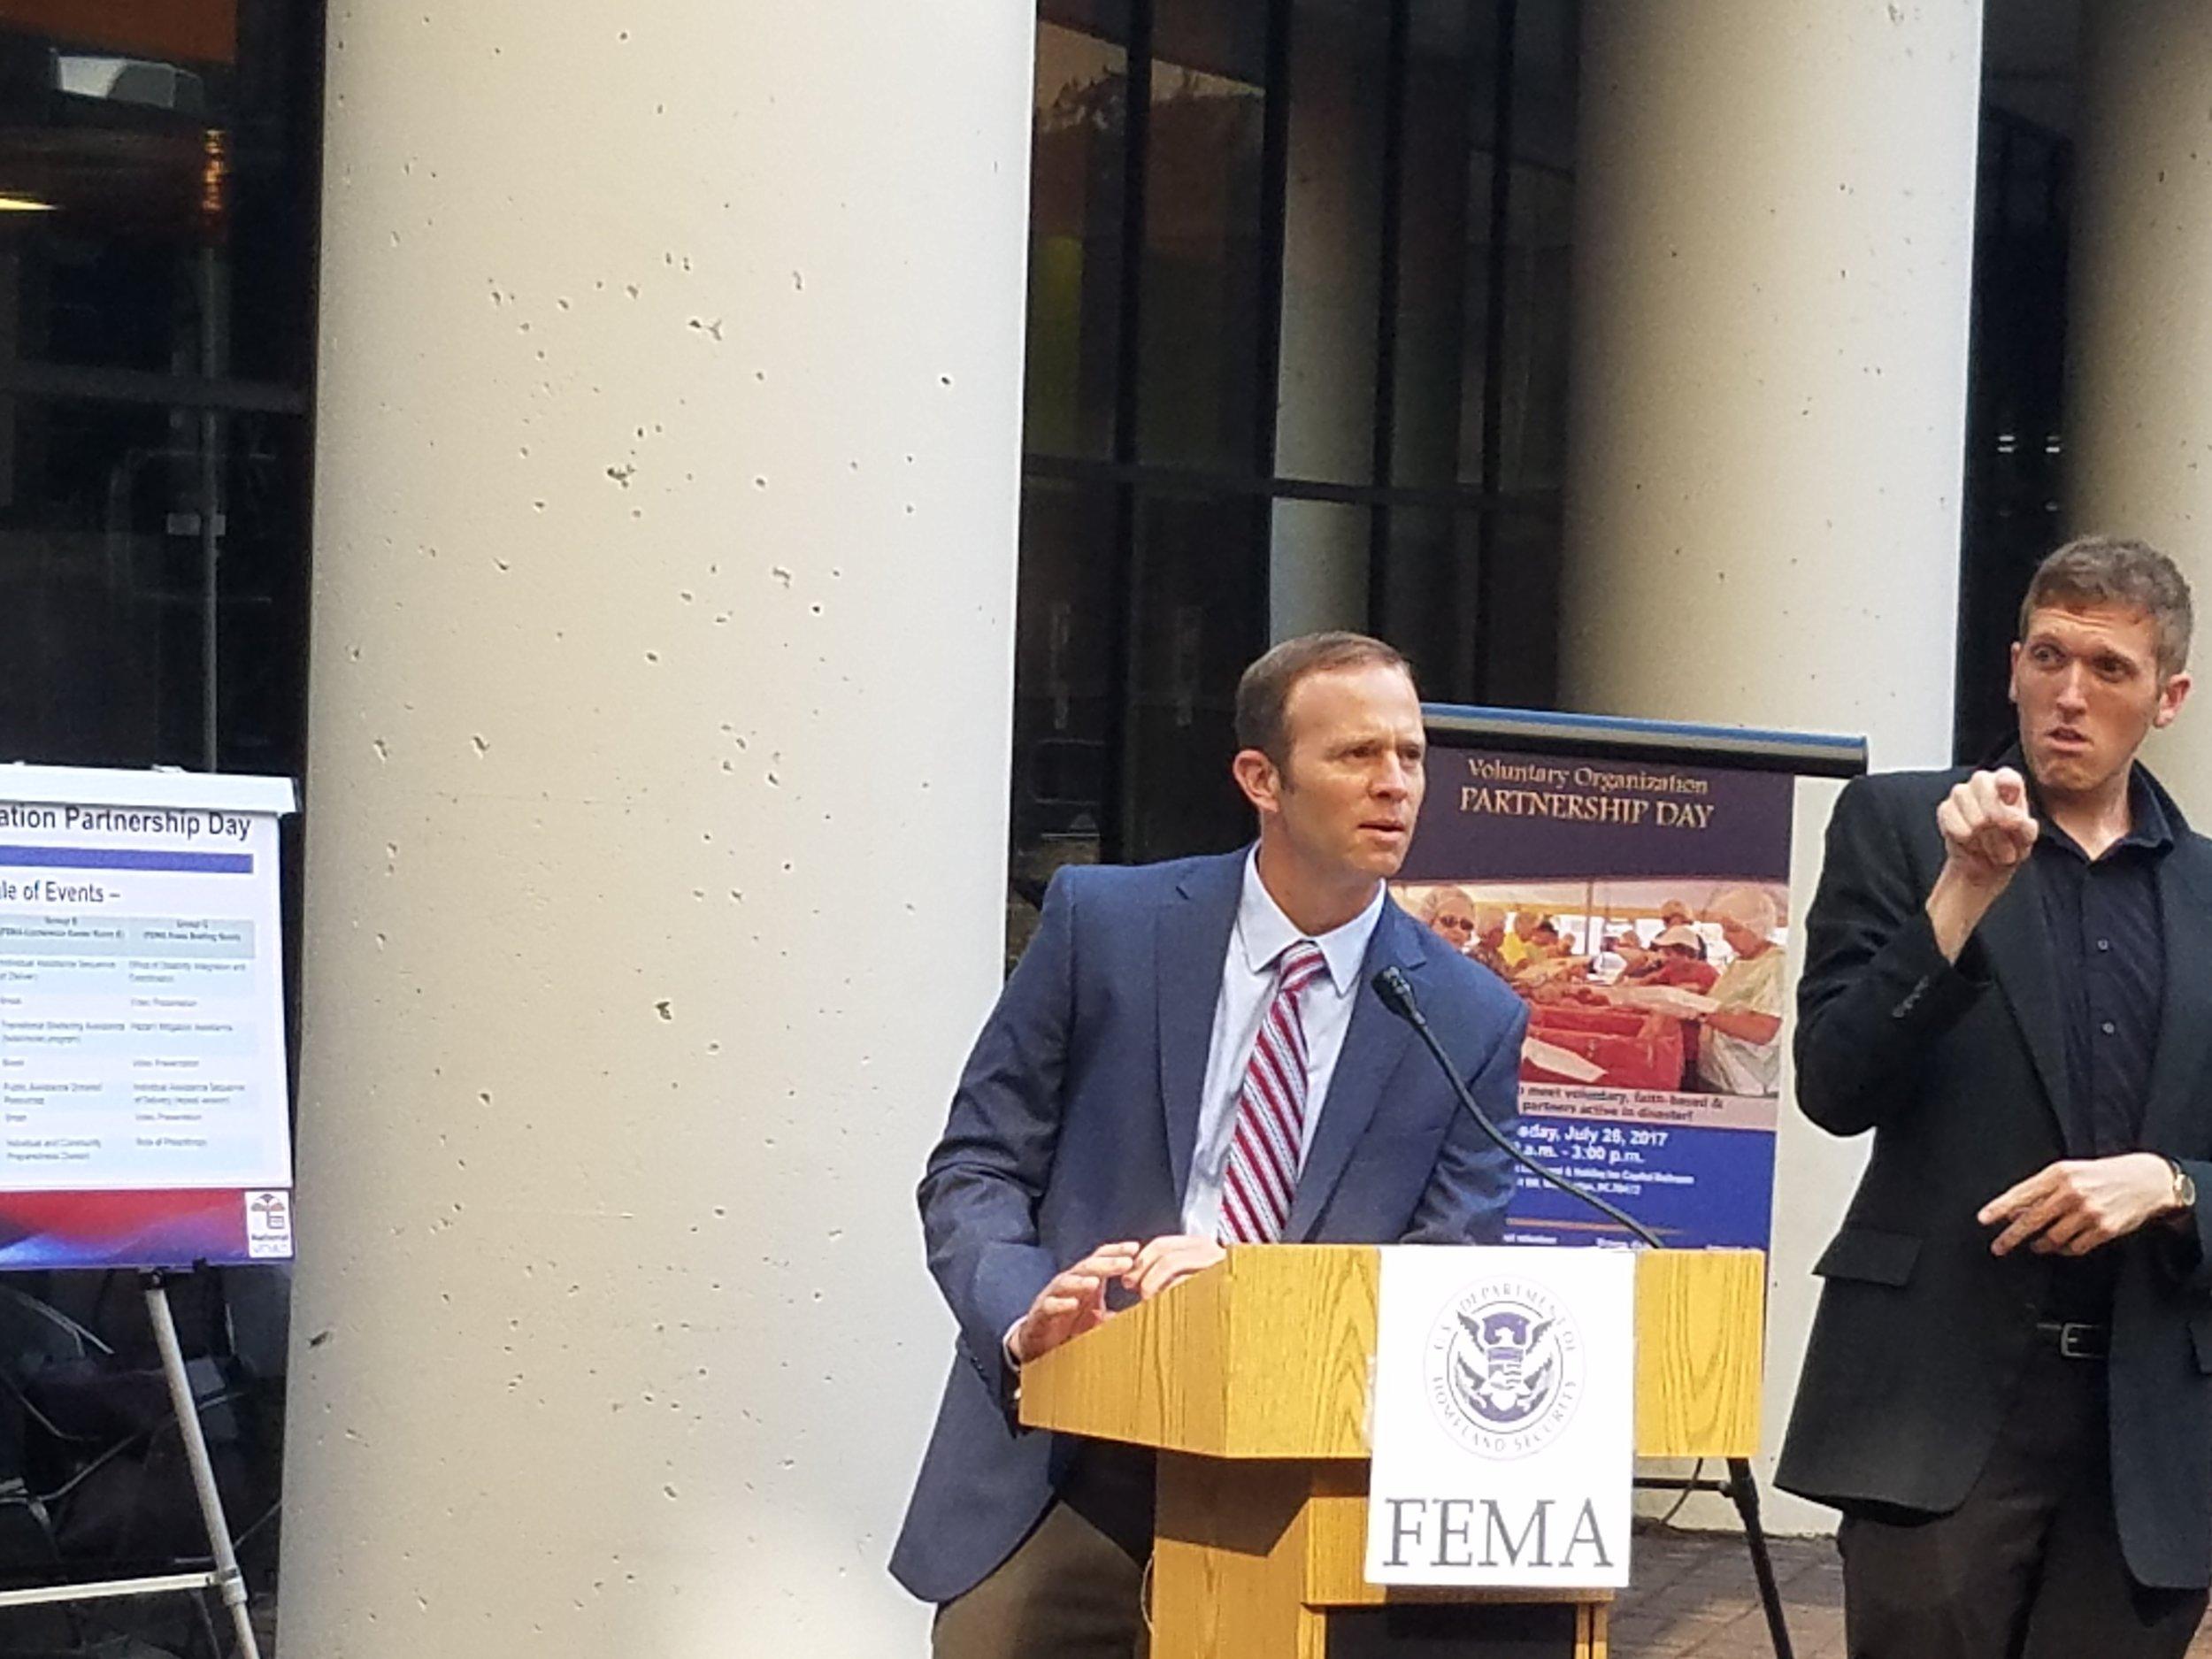 New FEMA administrator addresses crowd on Partnership day at FEMA headquarters.